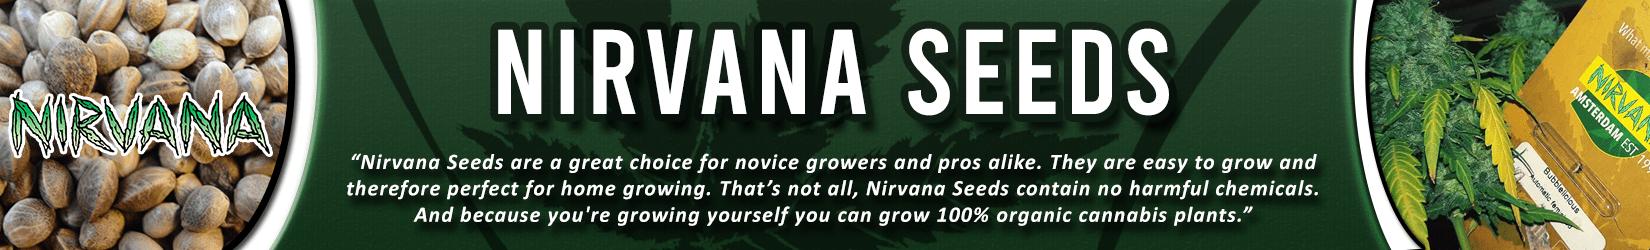 Cannabis Seeds Breeder - Nirvana Seeds